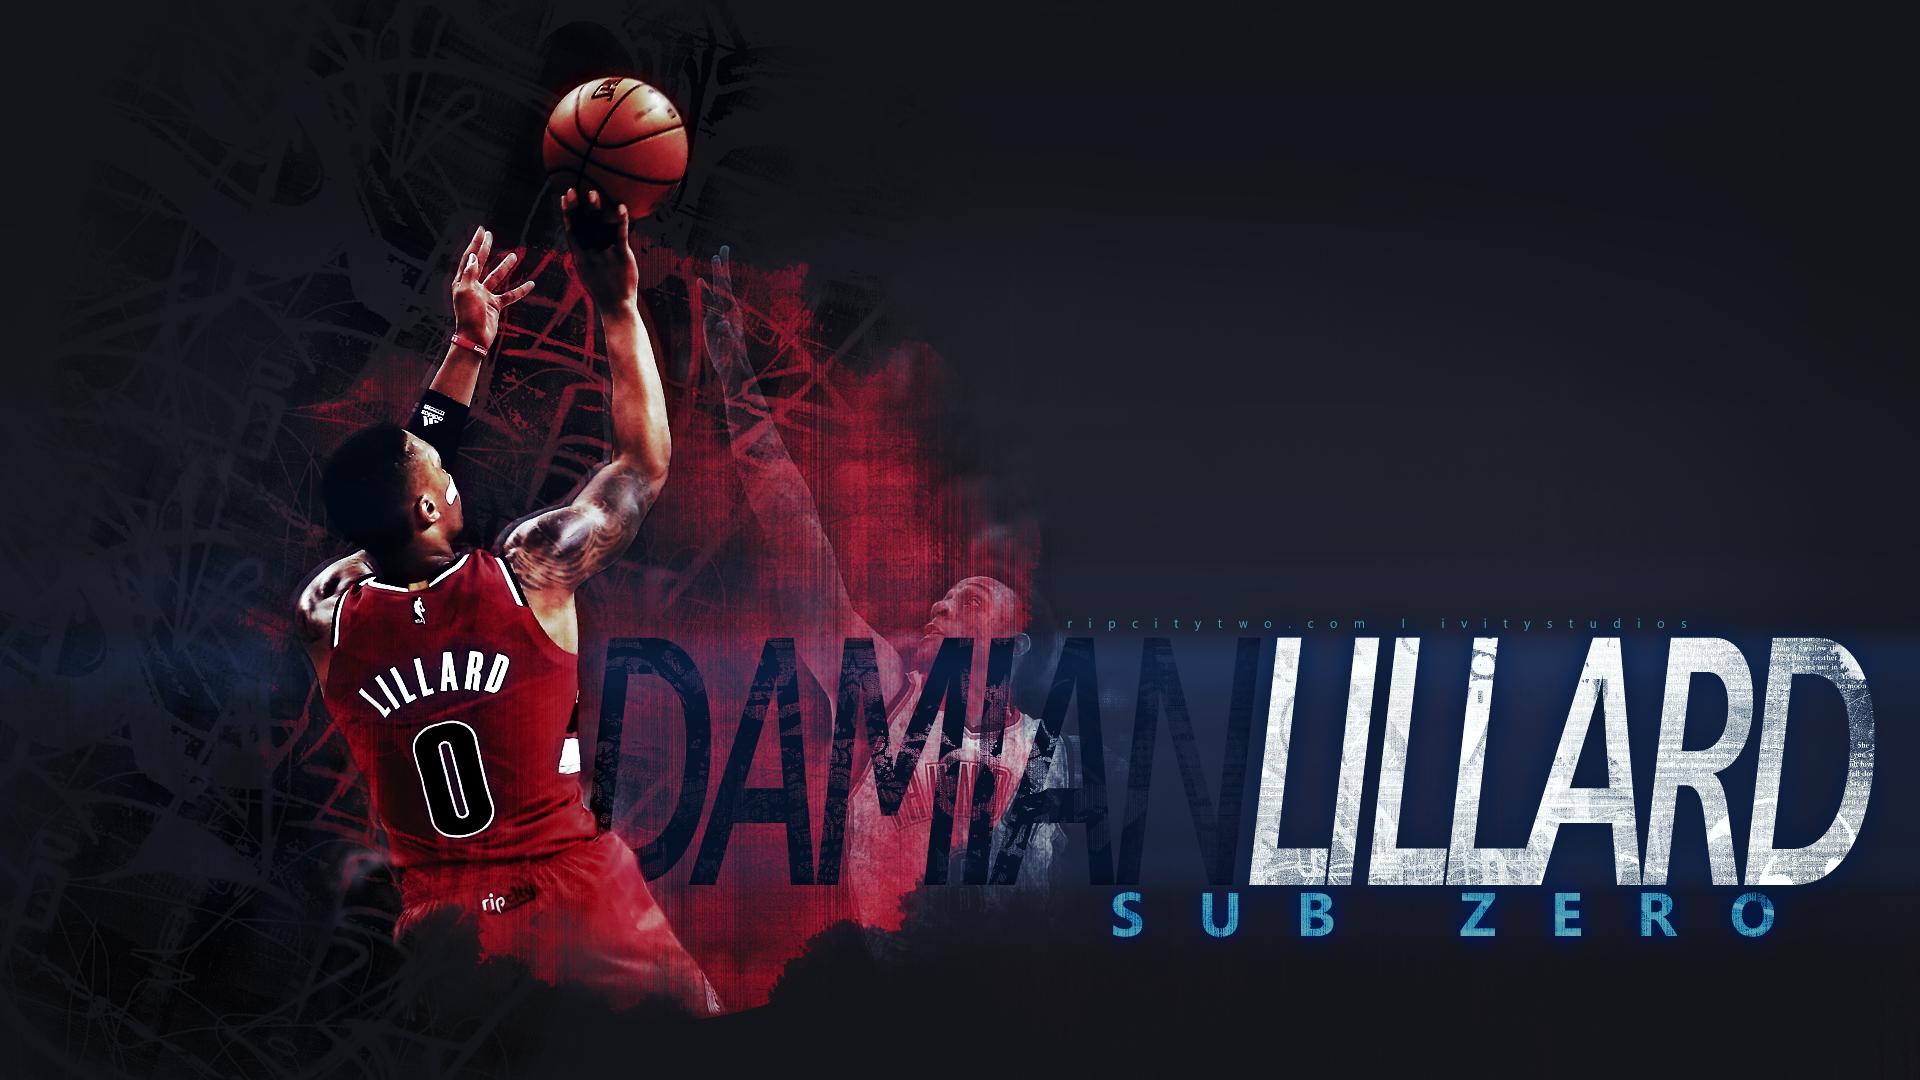 Wallpaper Damian Lillard Basketball Nba Portland Blazers Ivitystudios 1920x1080 Seanivity 1356291 Hd Wallpapers Wallhere